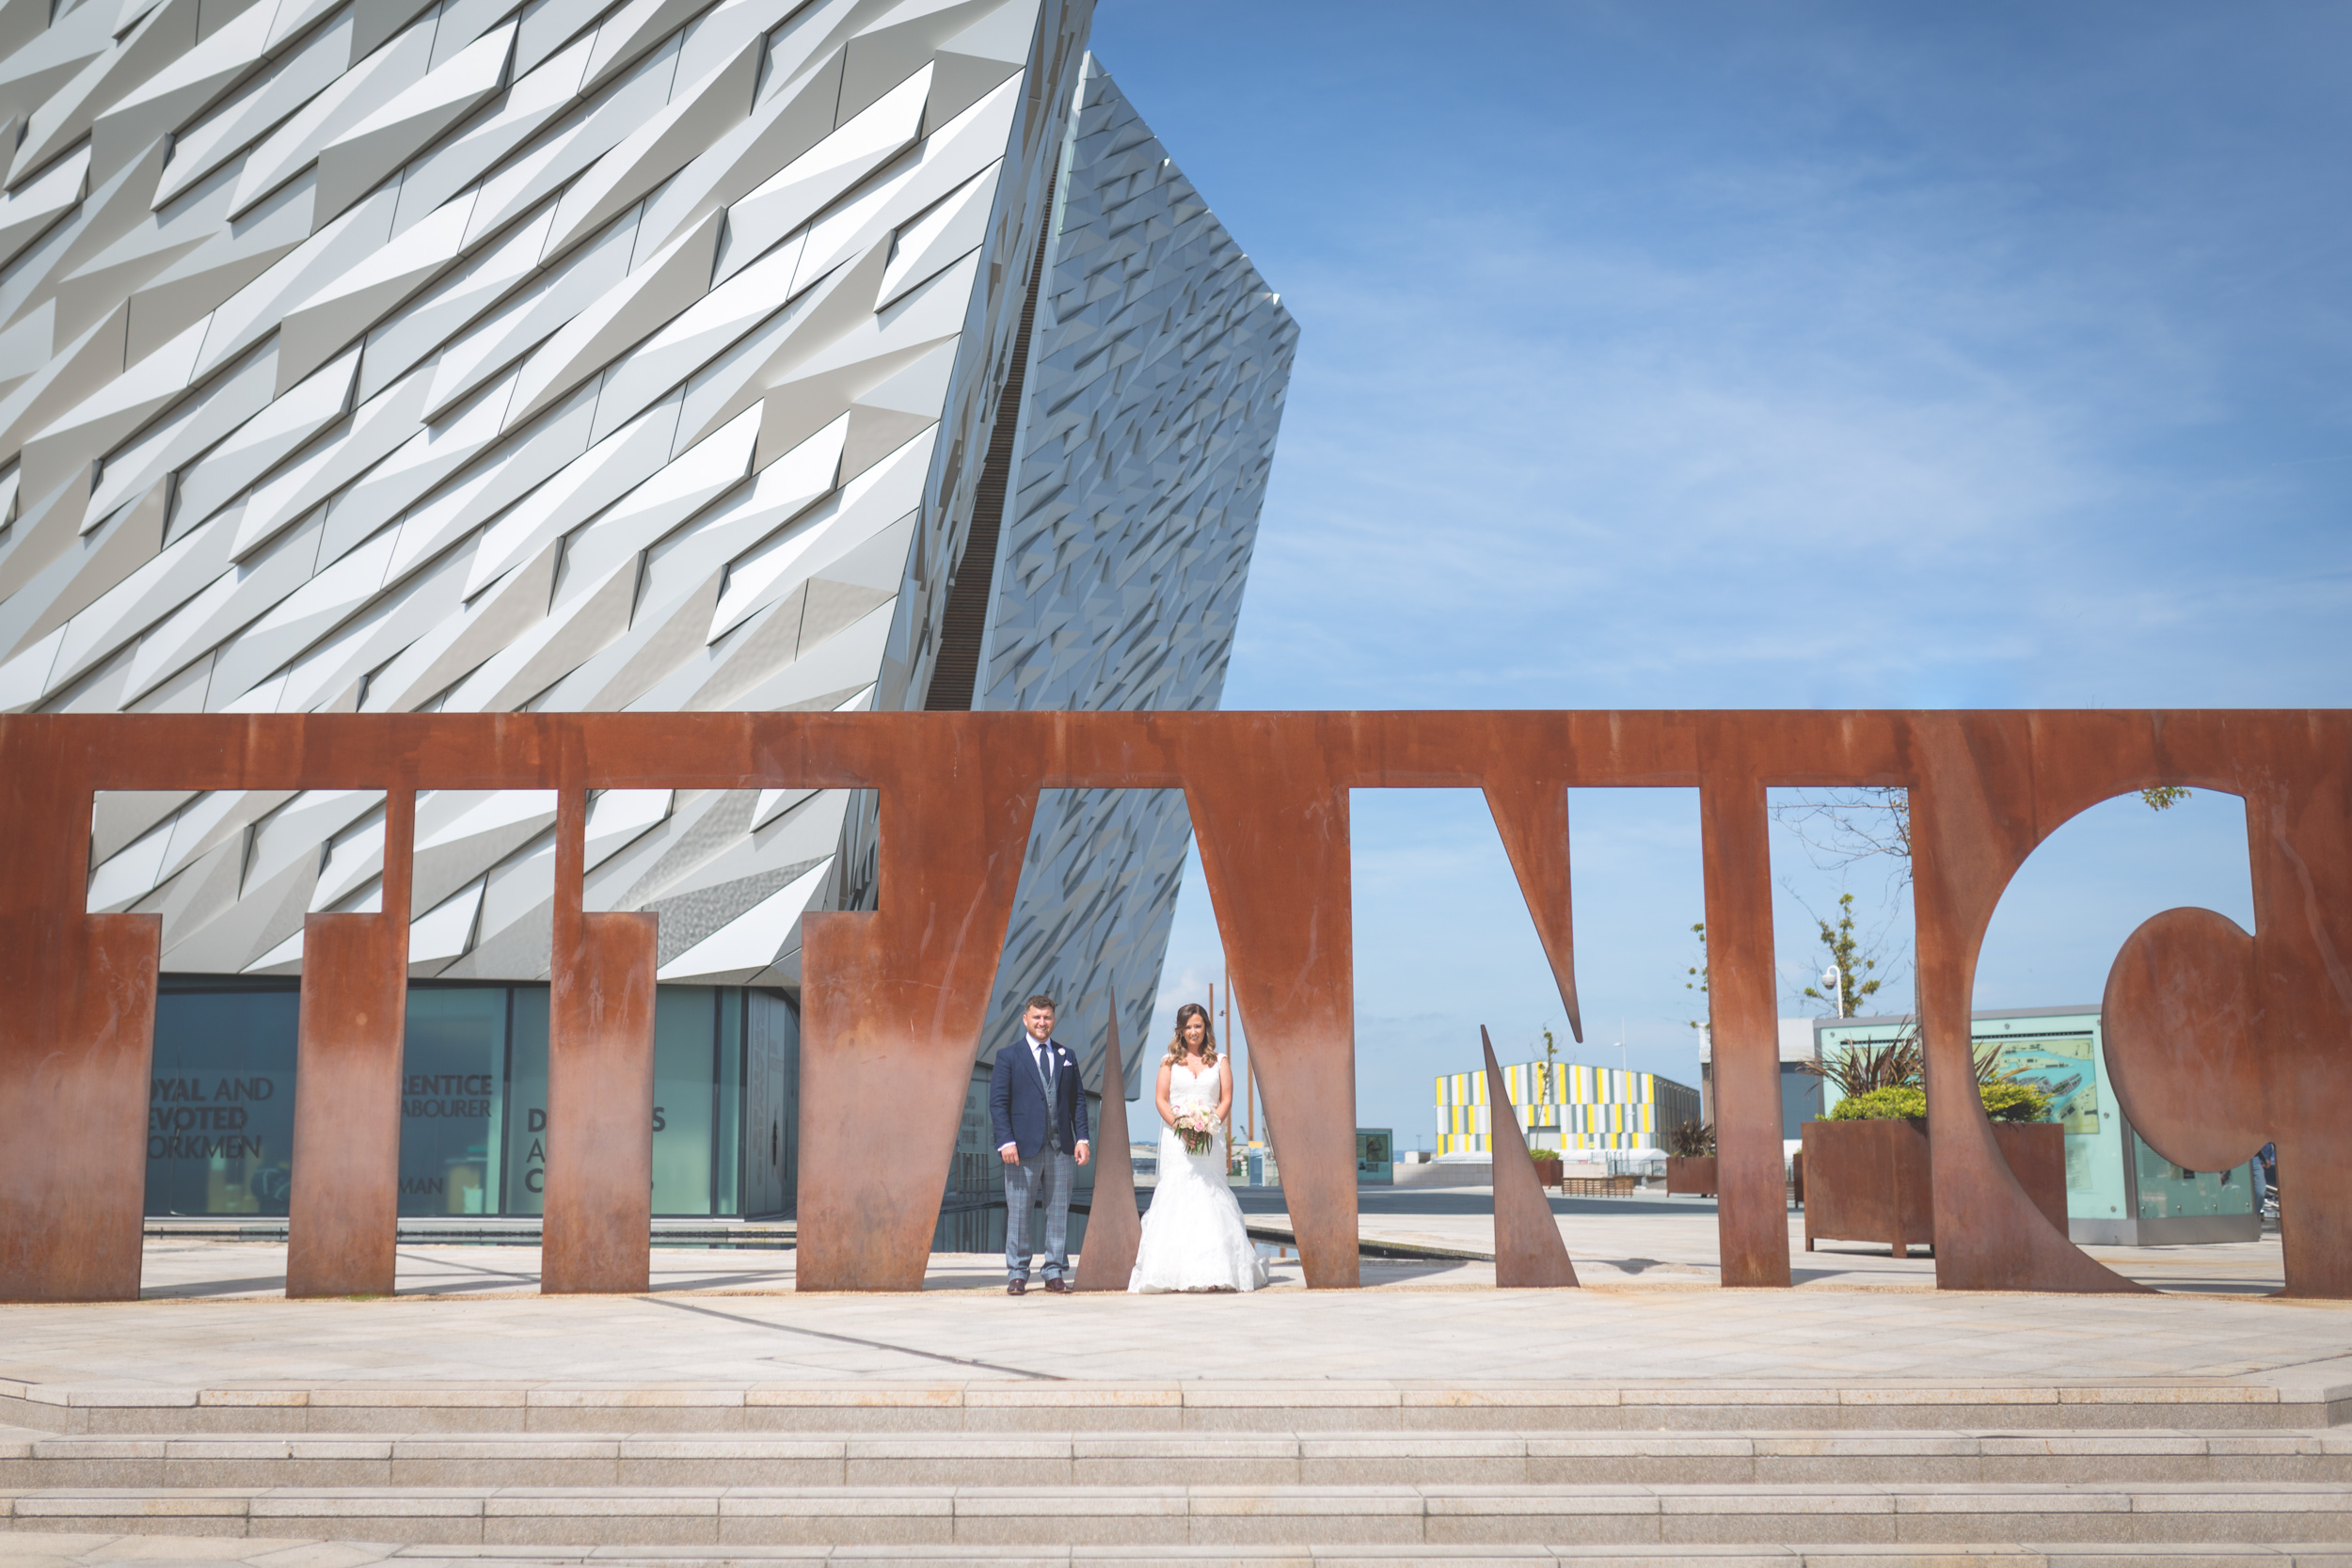 Brian McEwan   Northern Ireland Wedding Photographer   Rebecca & Michael   Portraits-71.jpg